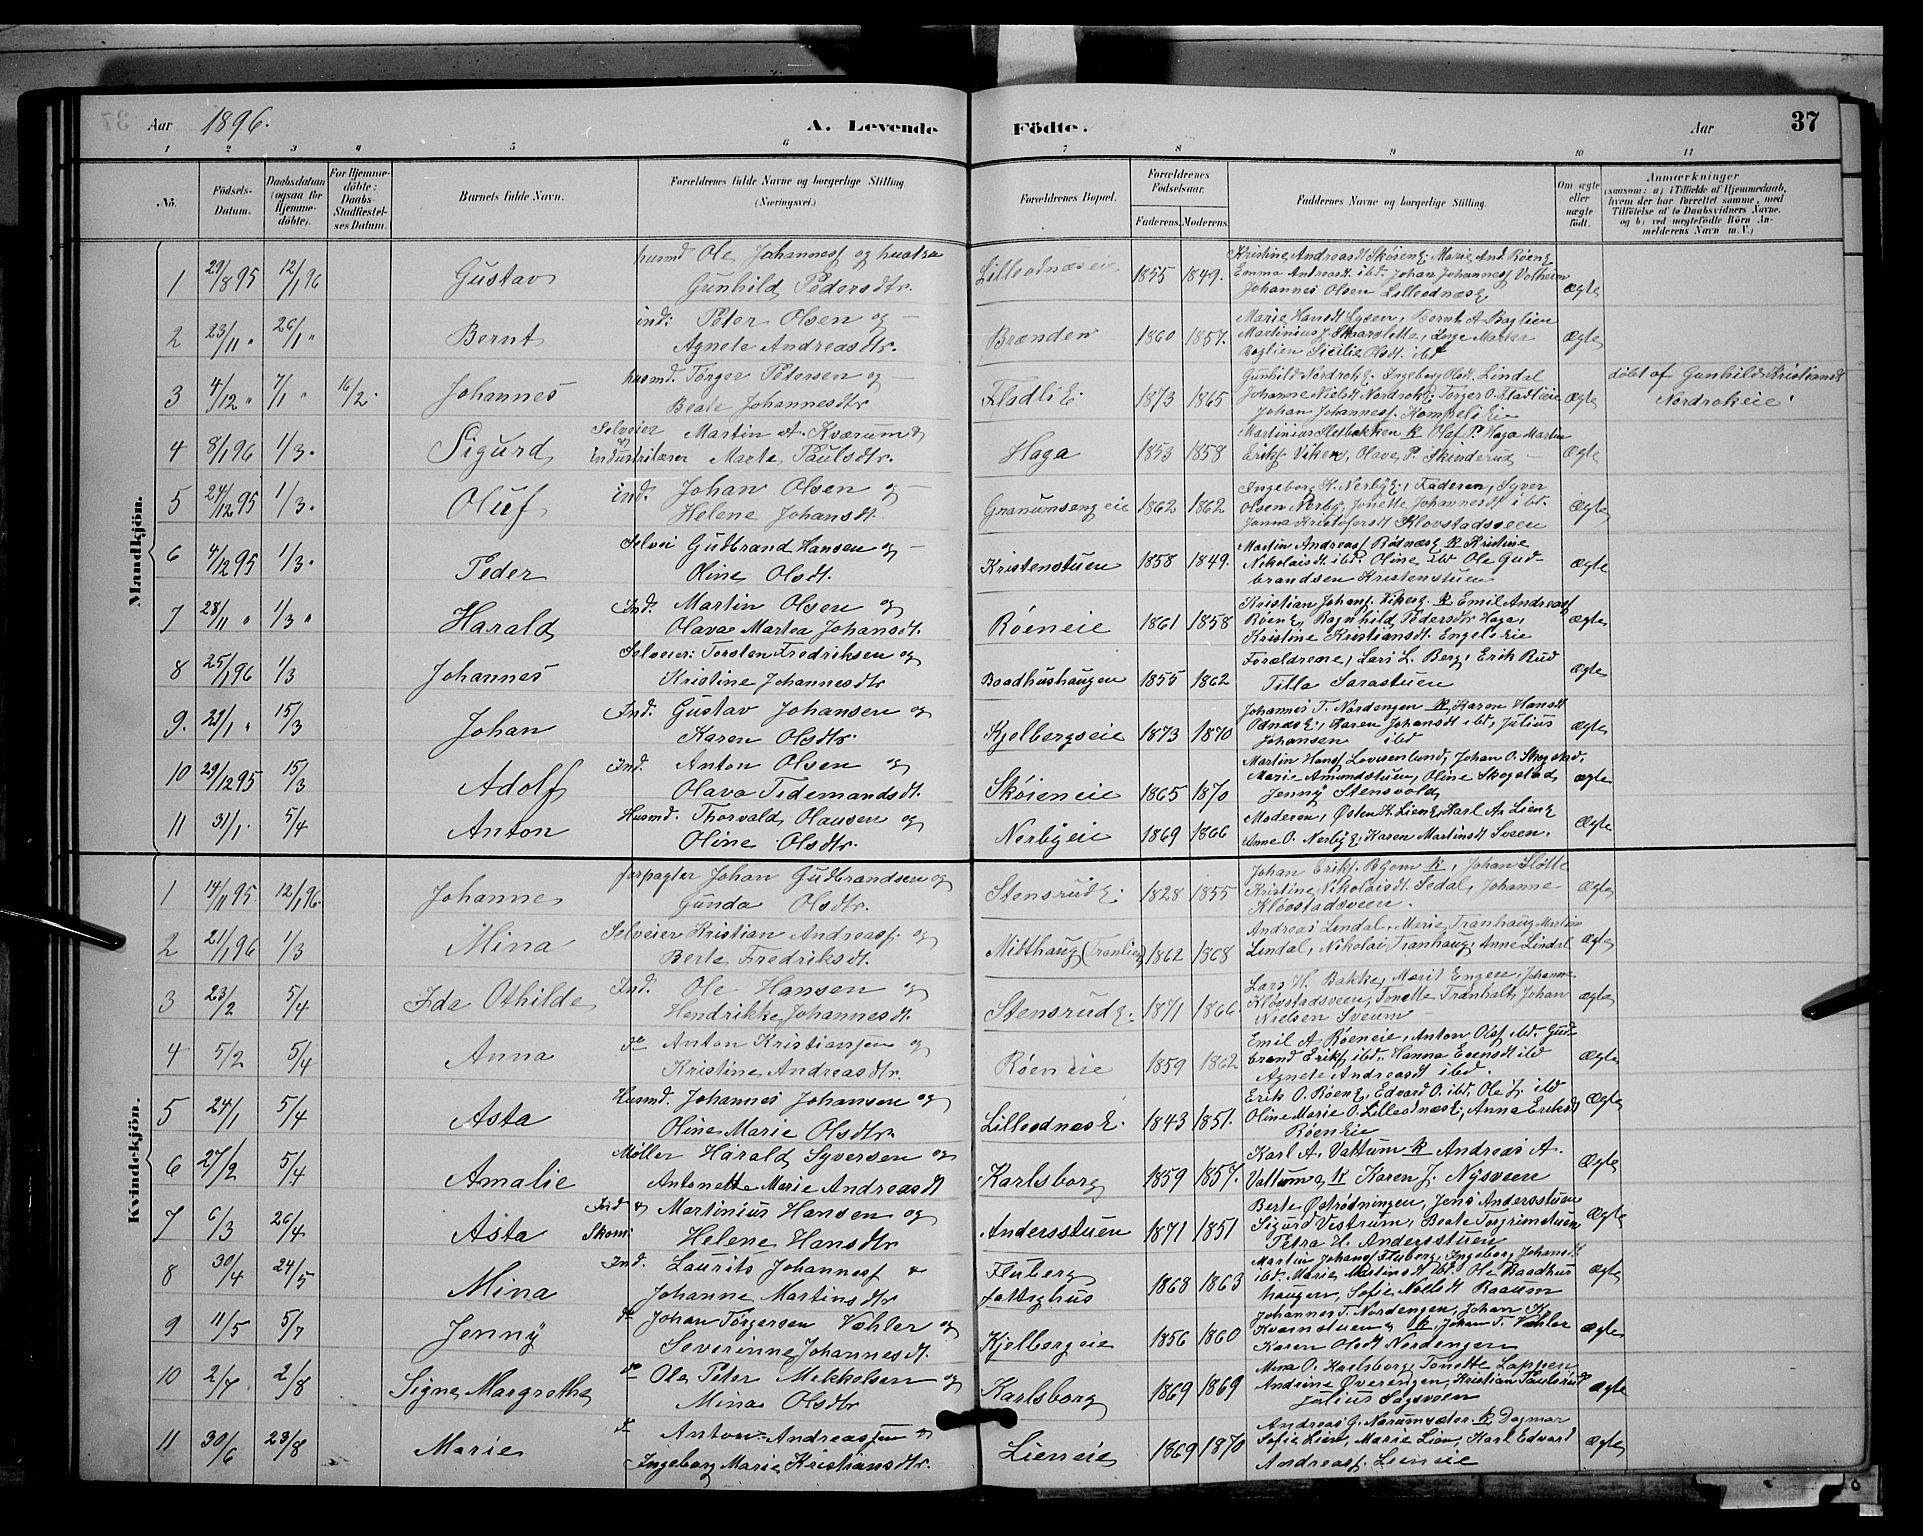 SAH, Søndre Land prestekontor, L/L0003: Klokkerbok nr. 3, 1884-1902, s. 37